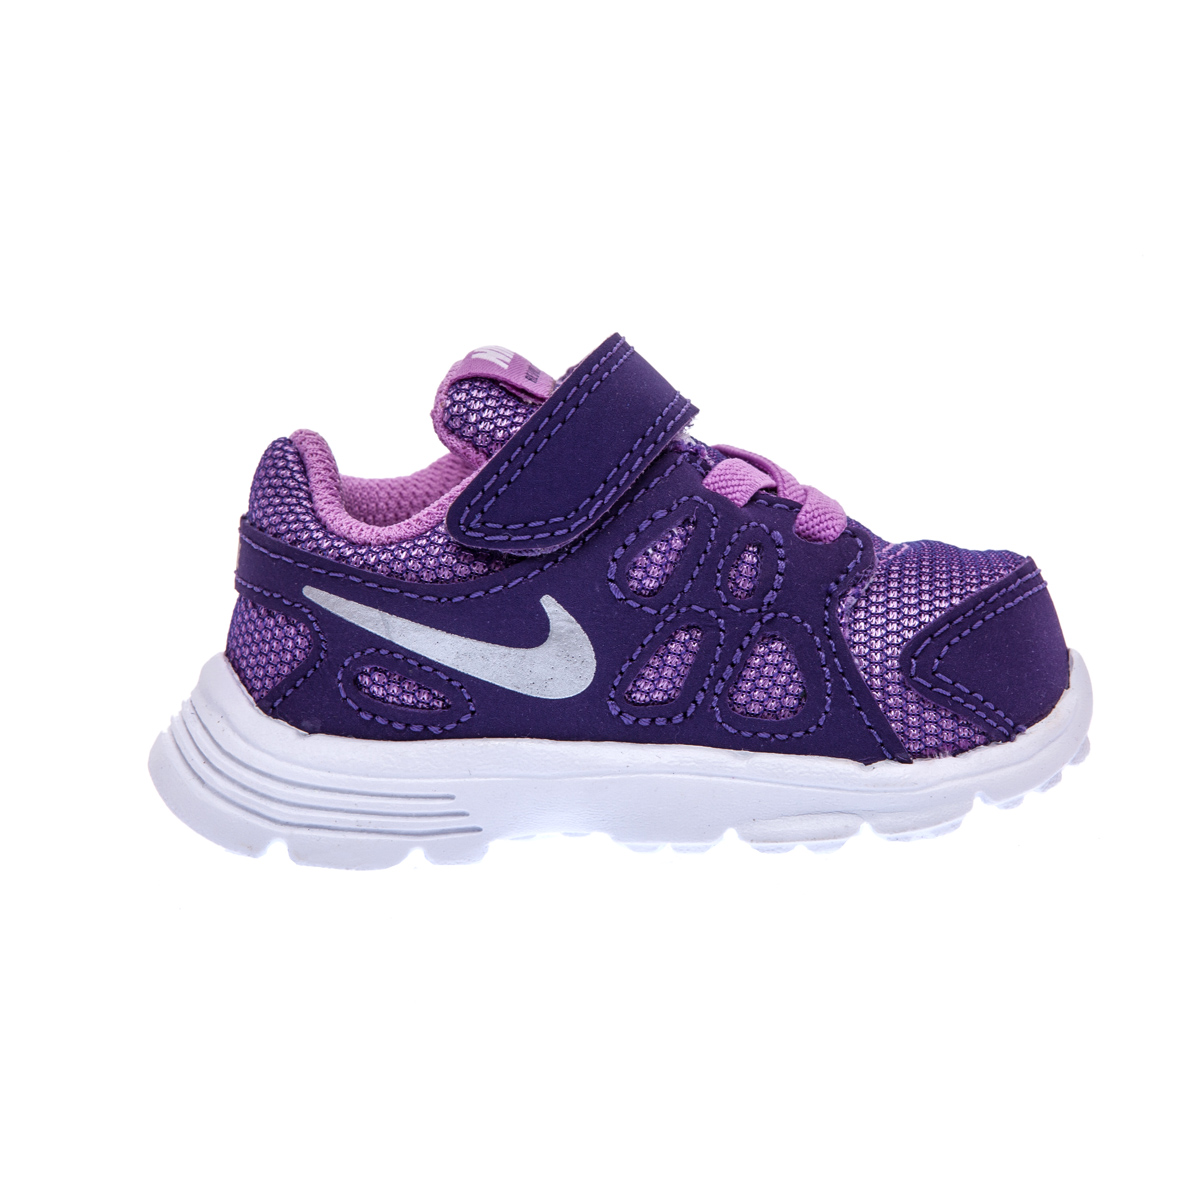 NIKE – Βρεφικά παπούτσια NIKE REVOLUTION 2 μωβ